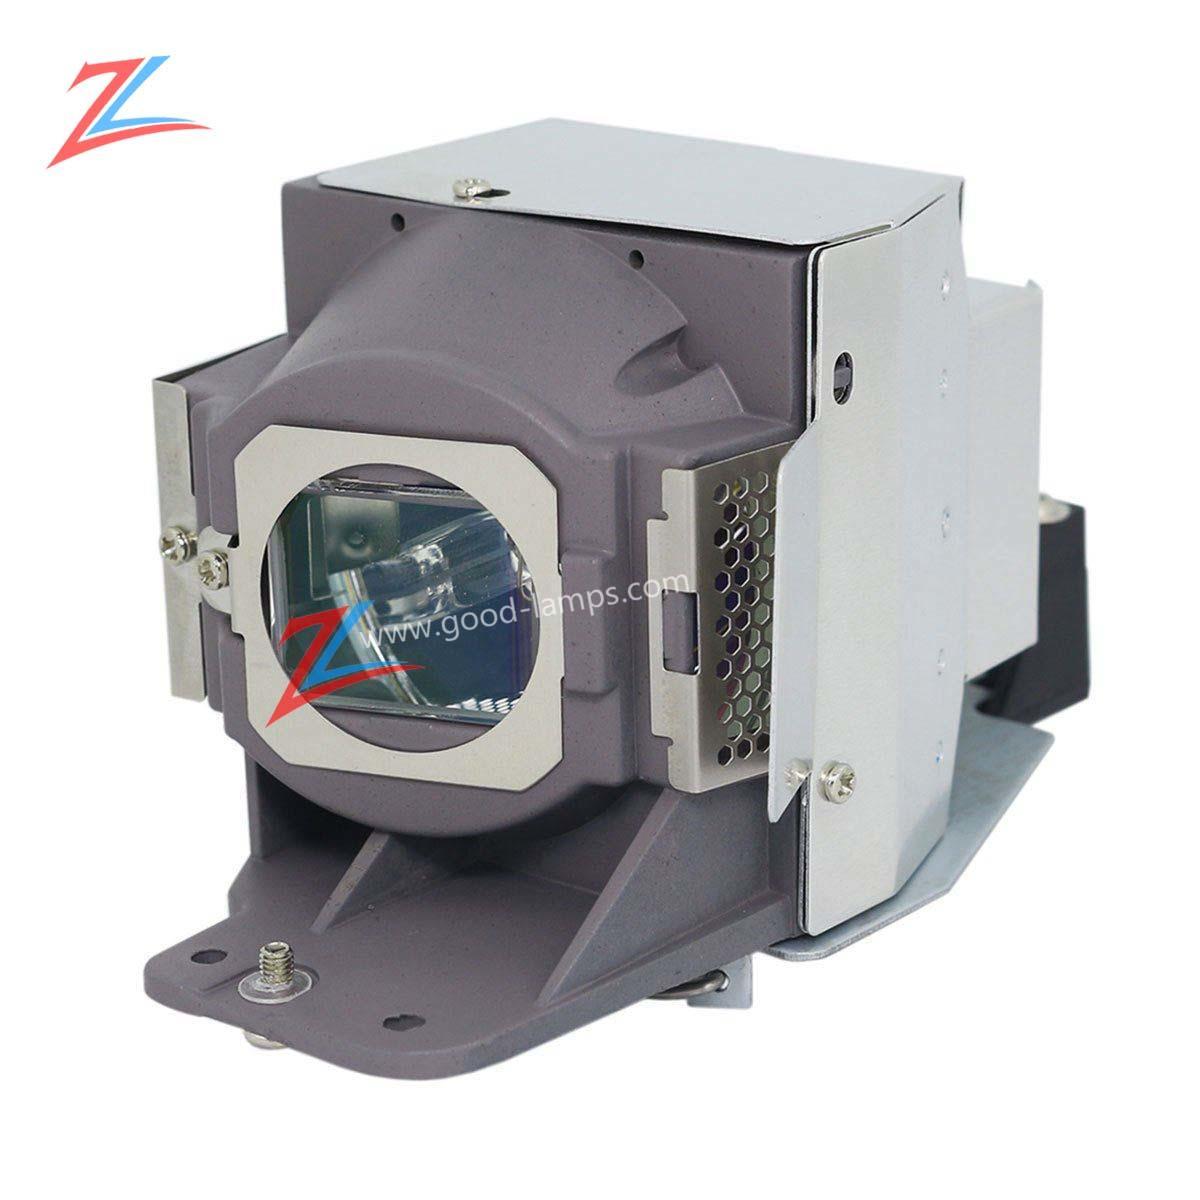 BenQ projector lamp 5J.JAH05.001 for Benq MH630 Benq MH680 Benq TH680